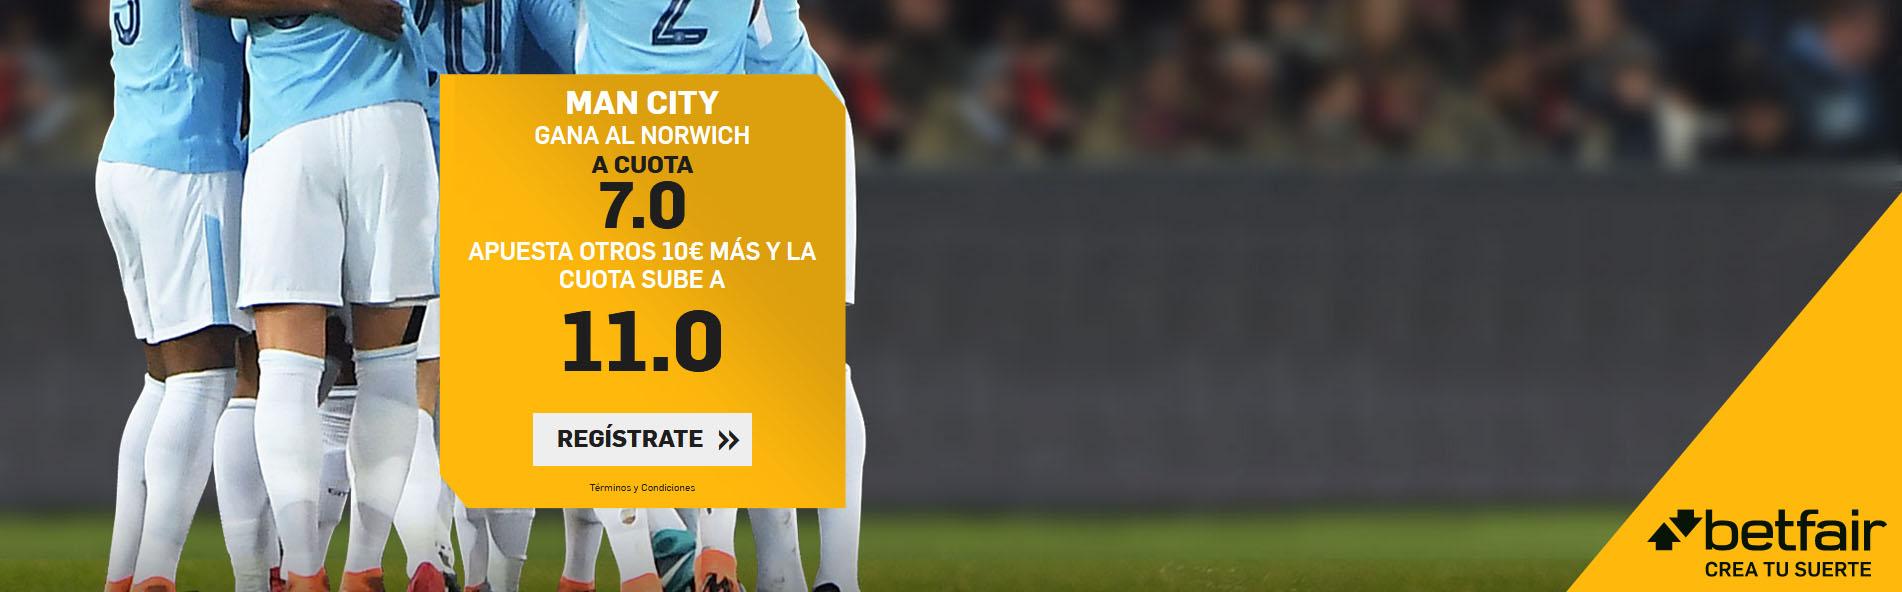 Manchester City gana al Norwich